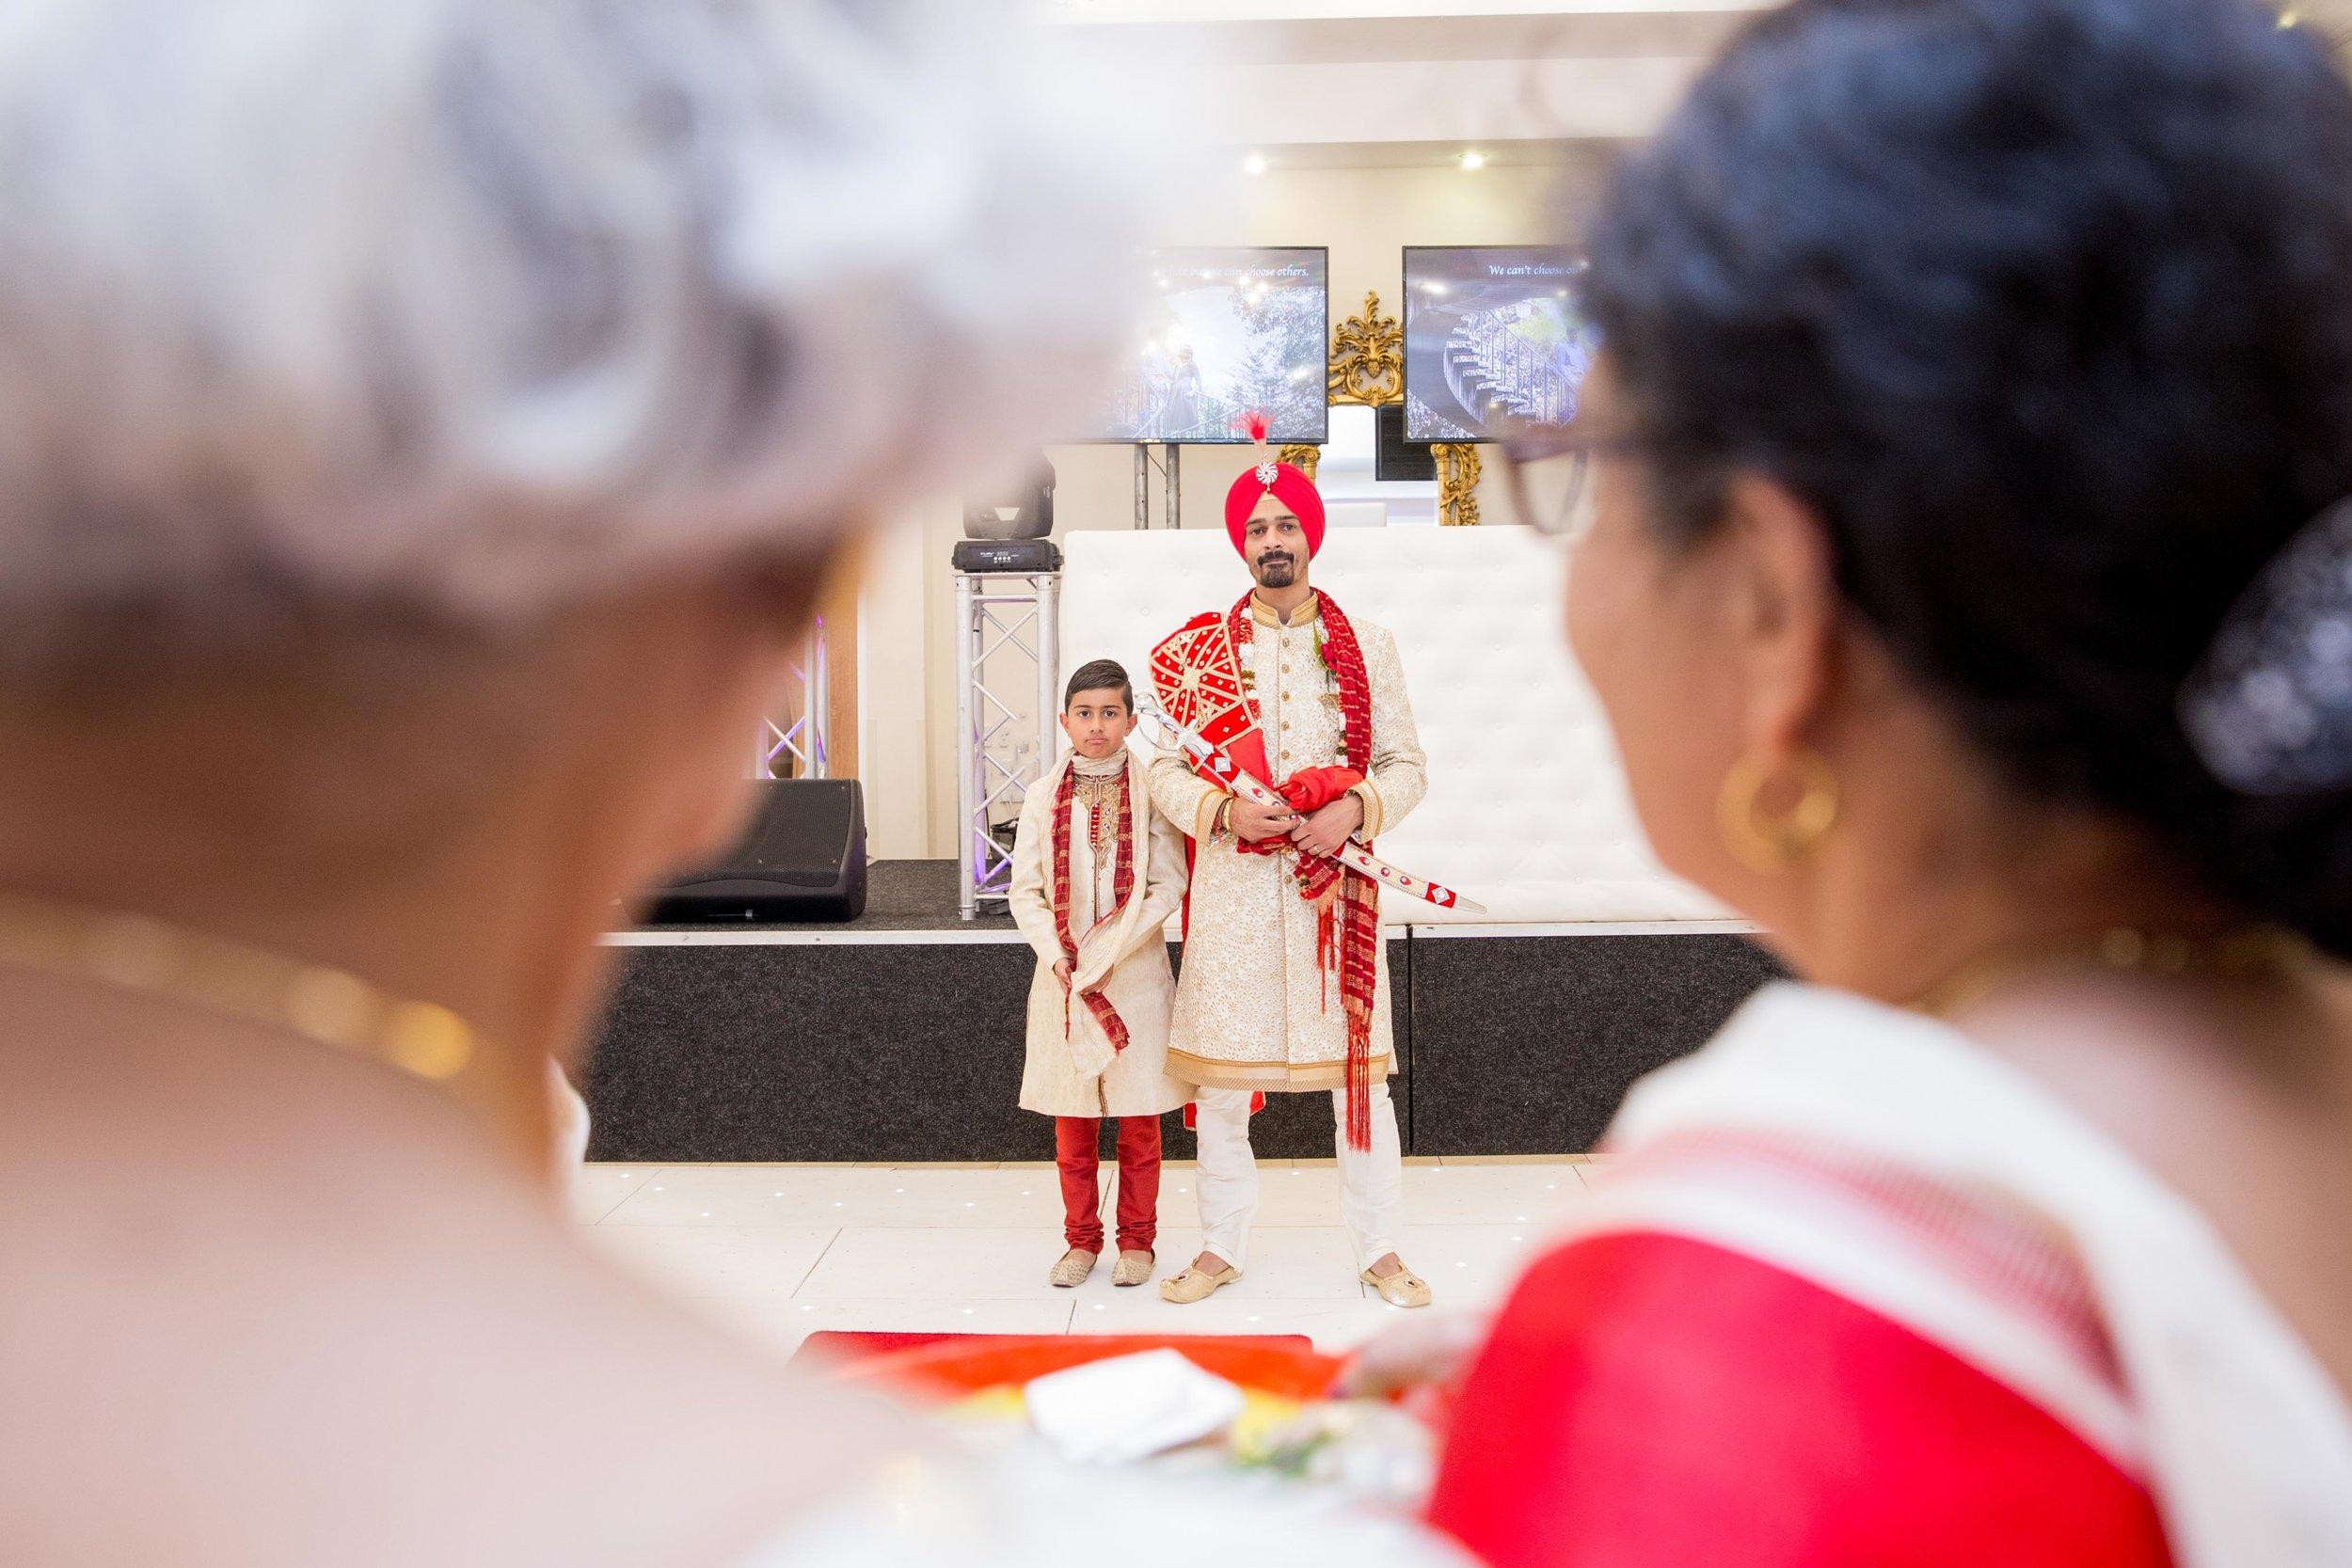 ramada-park-hall-hotel-birmingham-wolverhampton-hindu-wedding-asian-wedding-photography-natalia-smith-photography-17.jpg